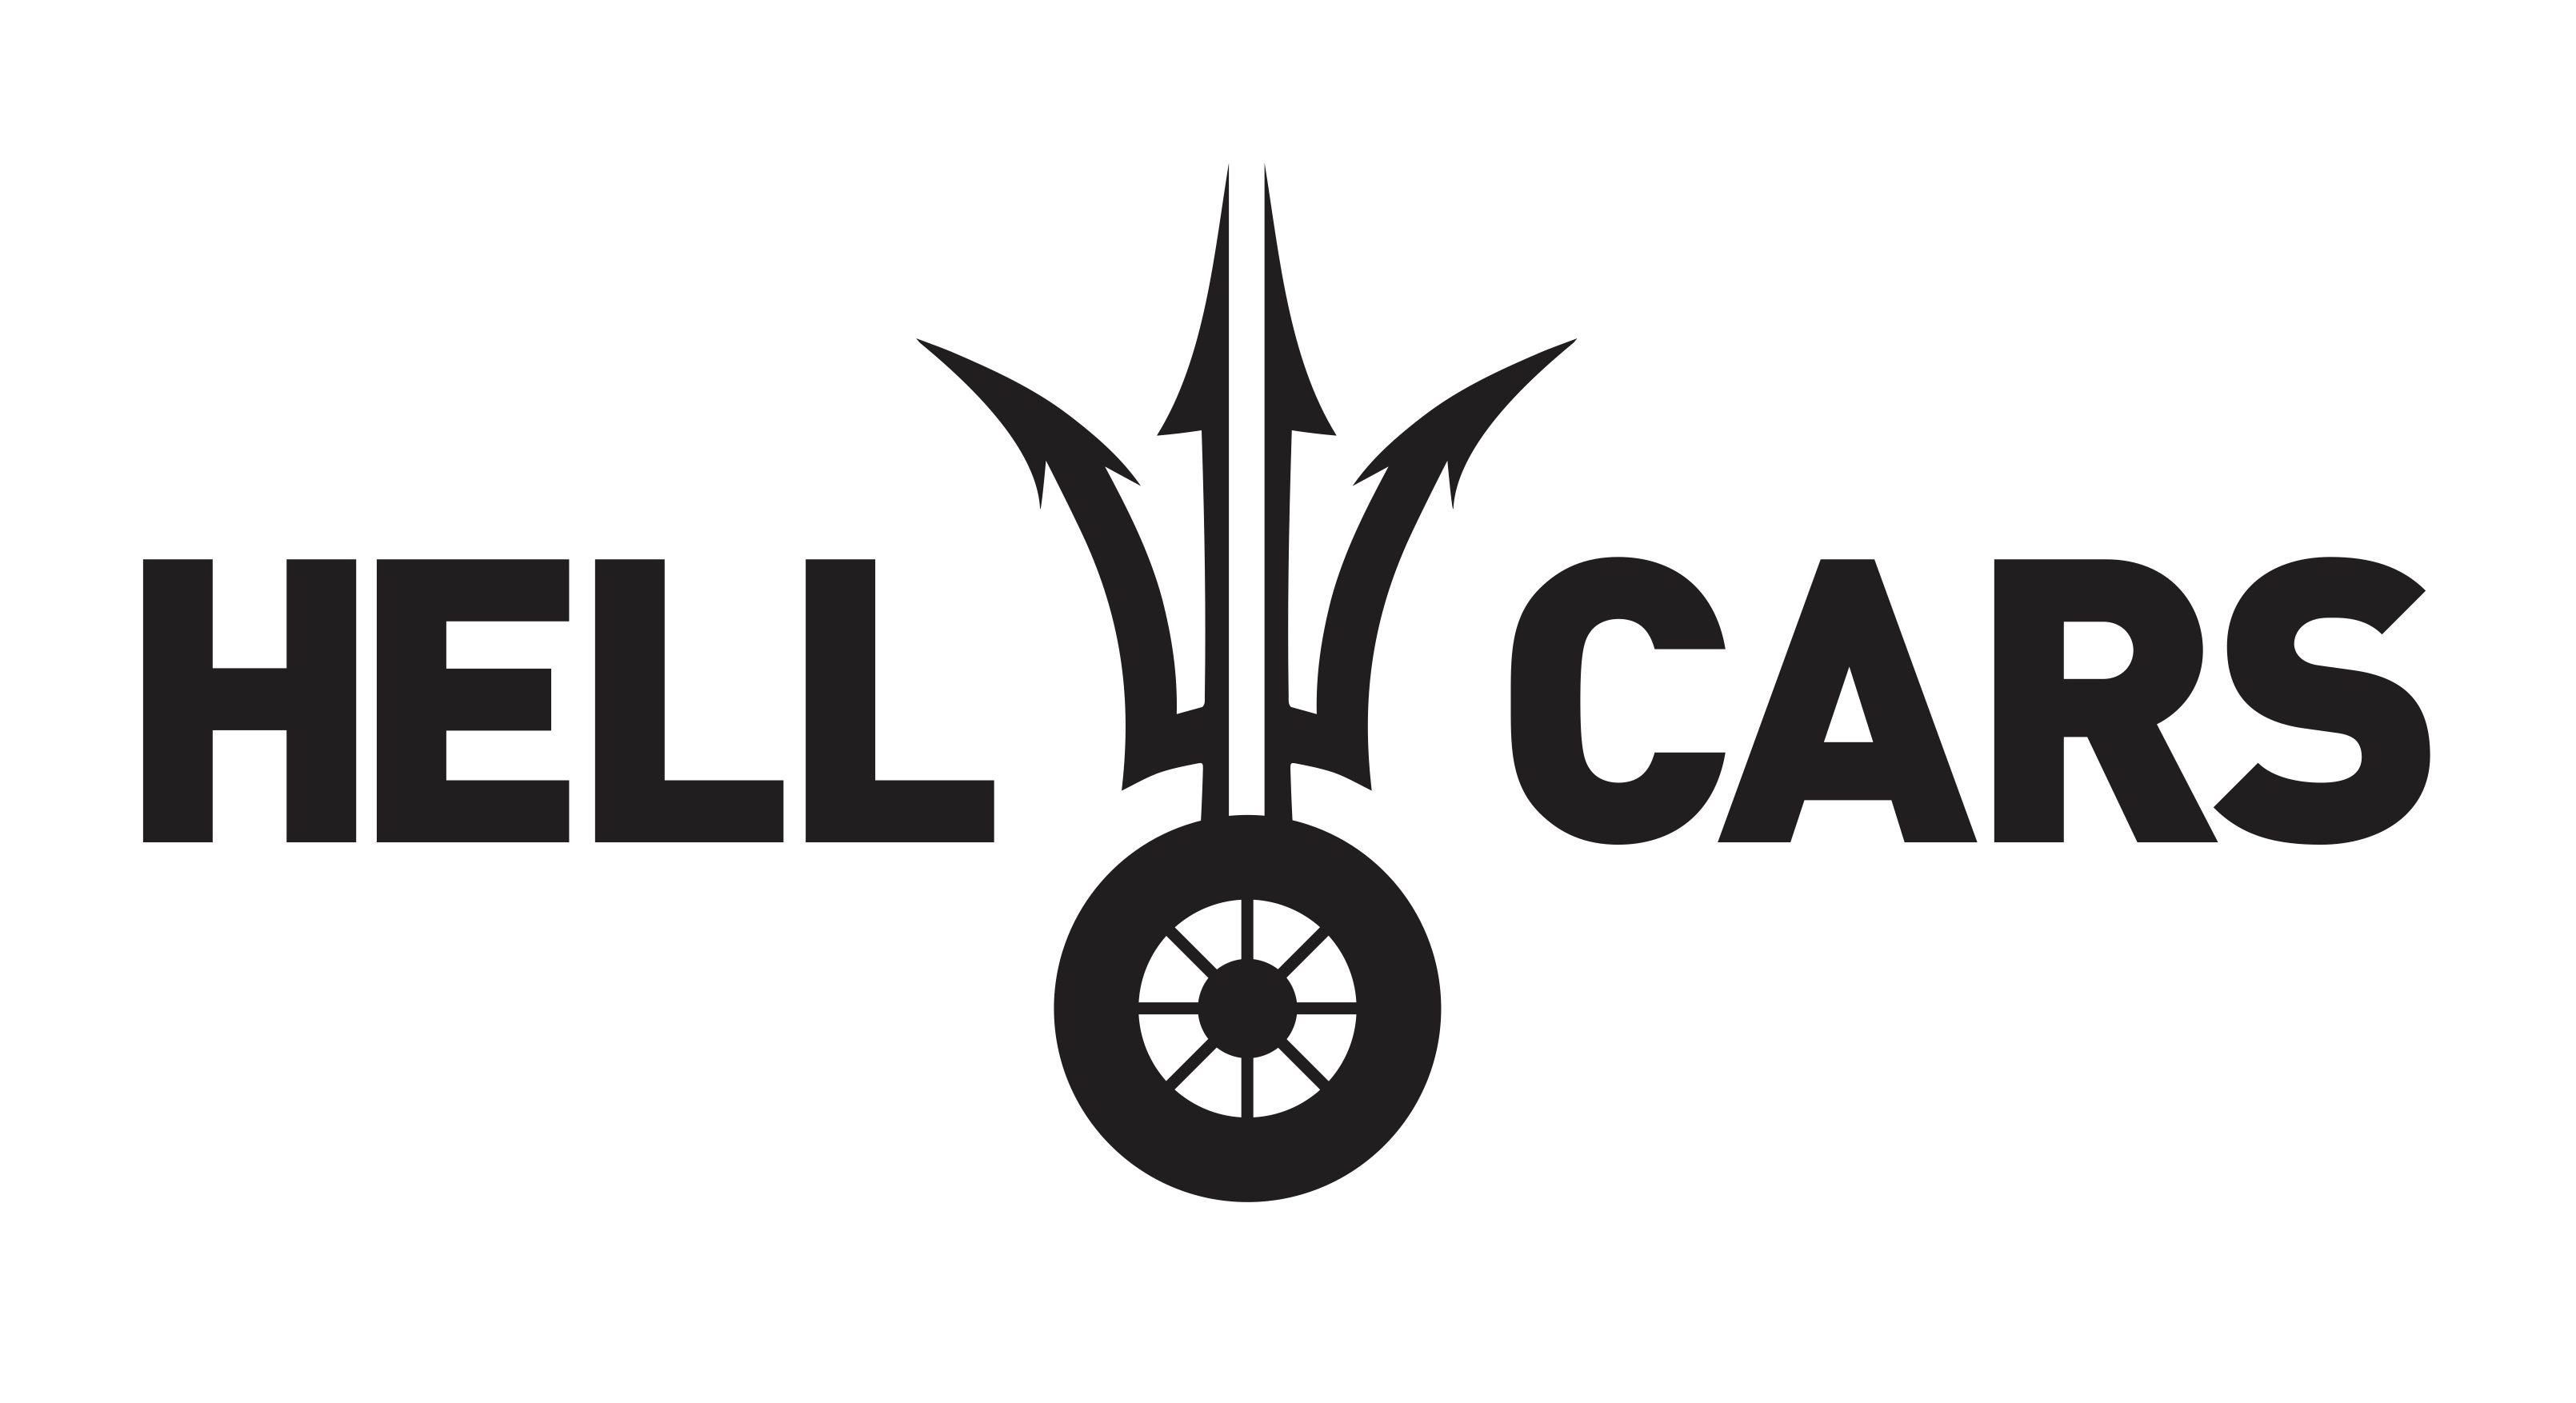 Hellcars